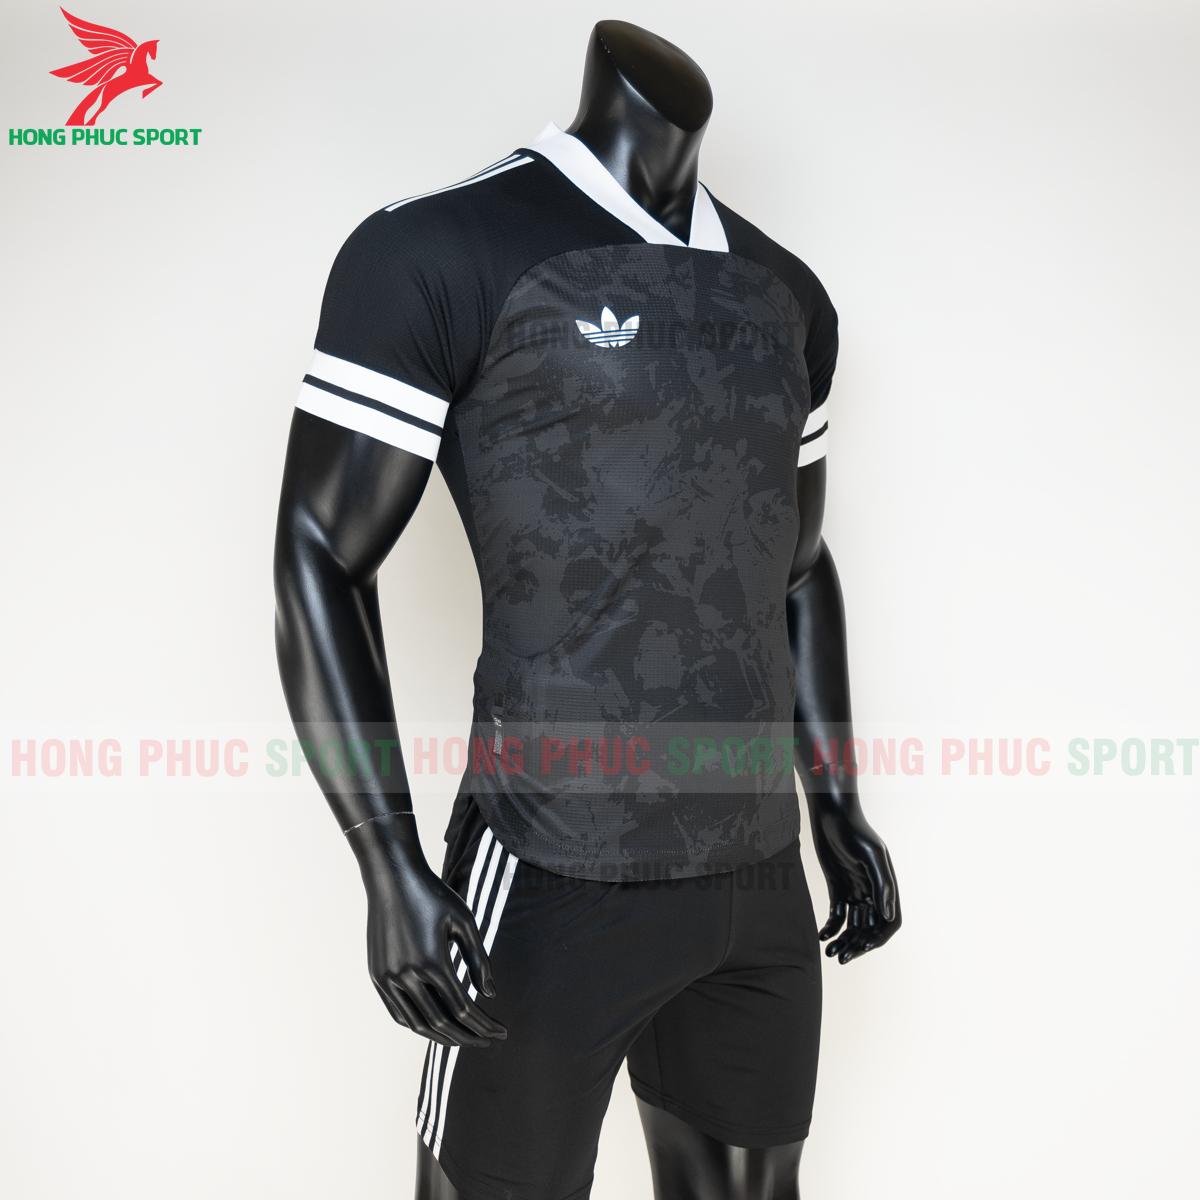 https://cdn.hongphucsport.com/unsafe/s4.shopbay.vn/files/285/ao-bong-da-condivo-template-20-21-hang-thailand-mau3-6-5fae52c424f5d.png